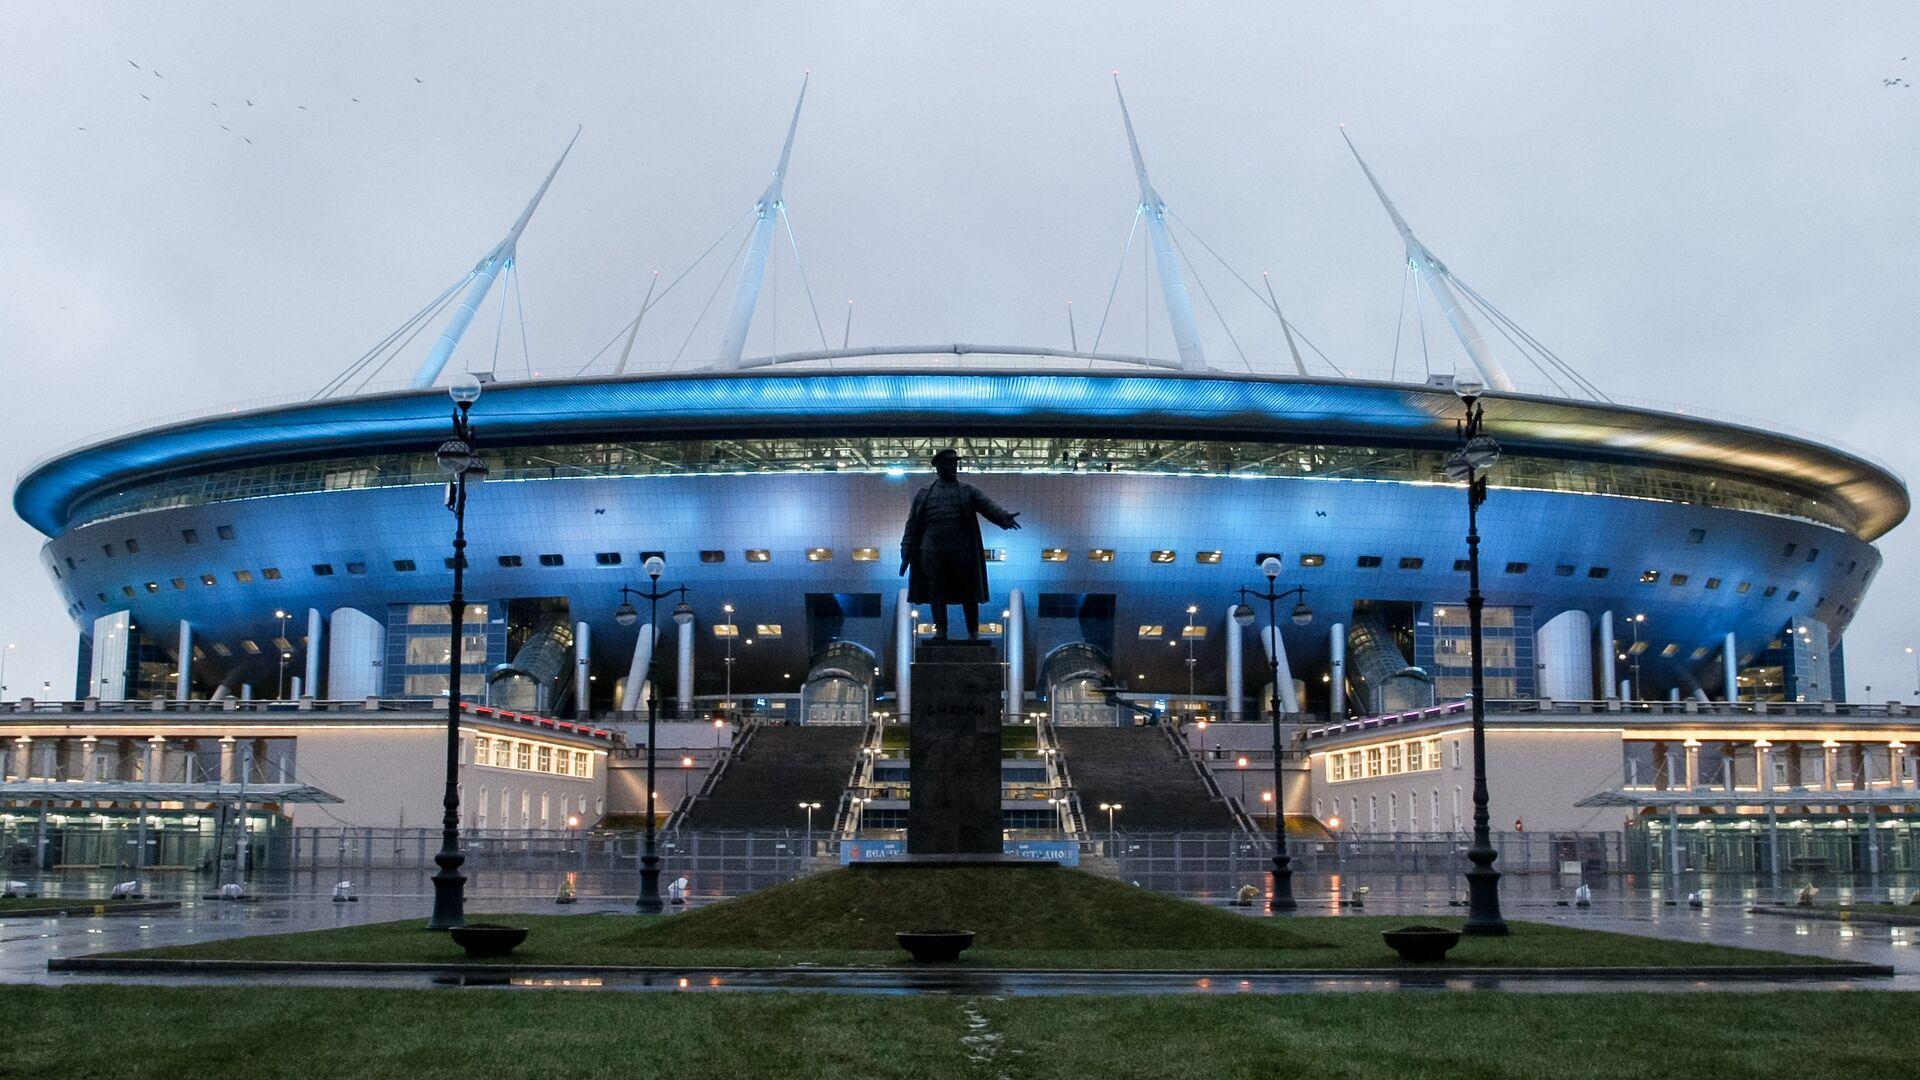 Стадион Зенит-Арена в Санкт-Петербурге - РИА Новости, 1920, 30.10.2019